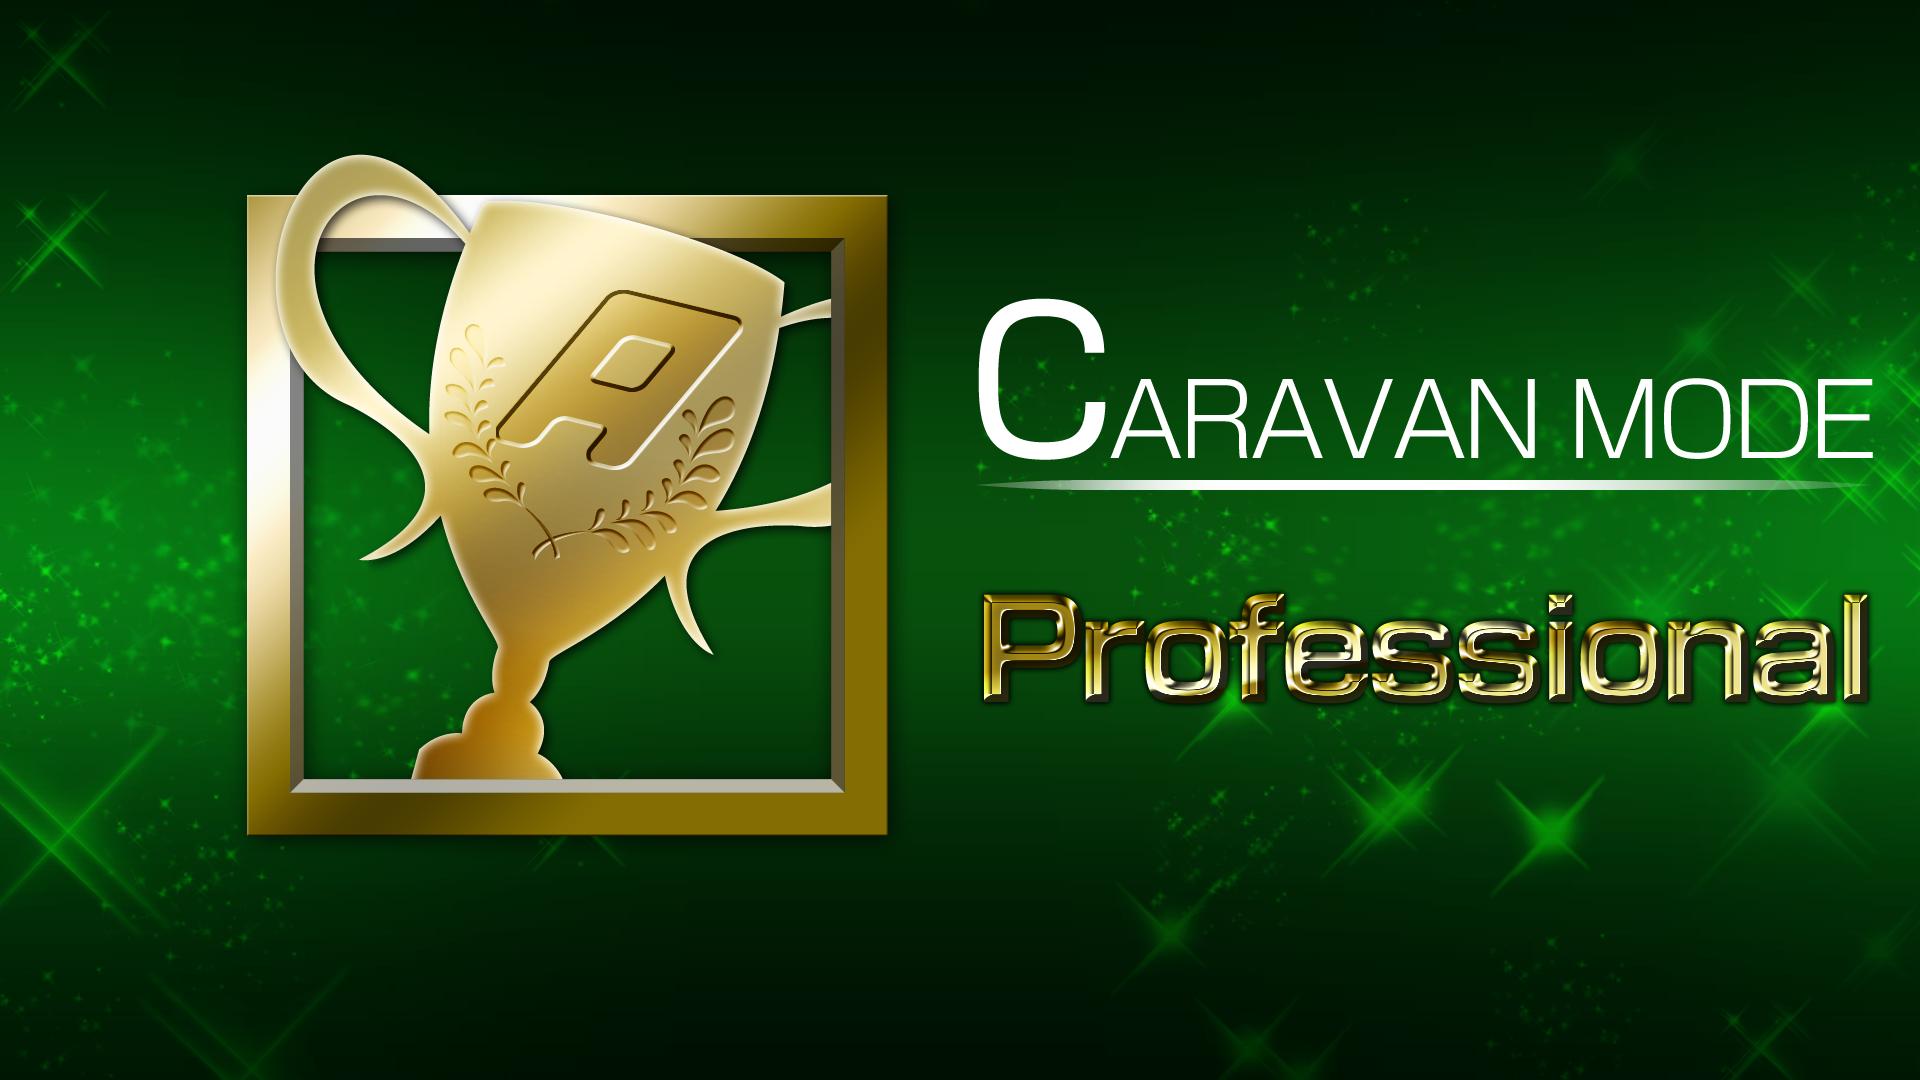 Icon for CARAVAN MODE 3 points